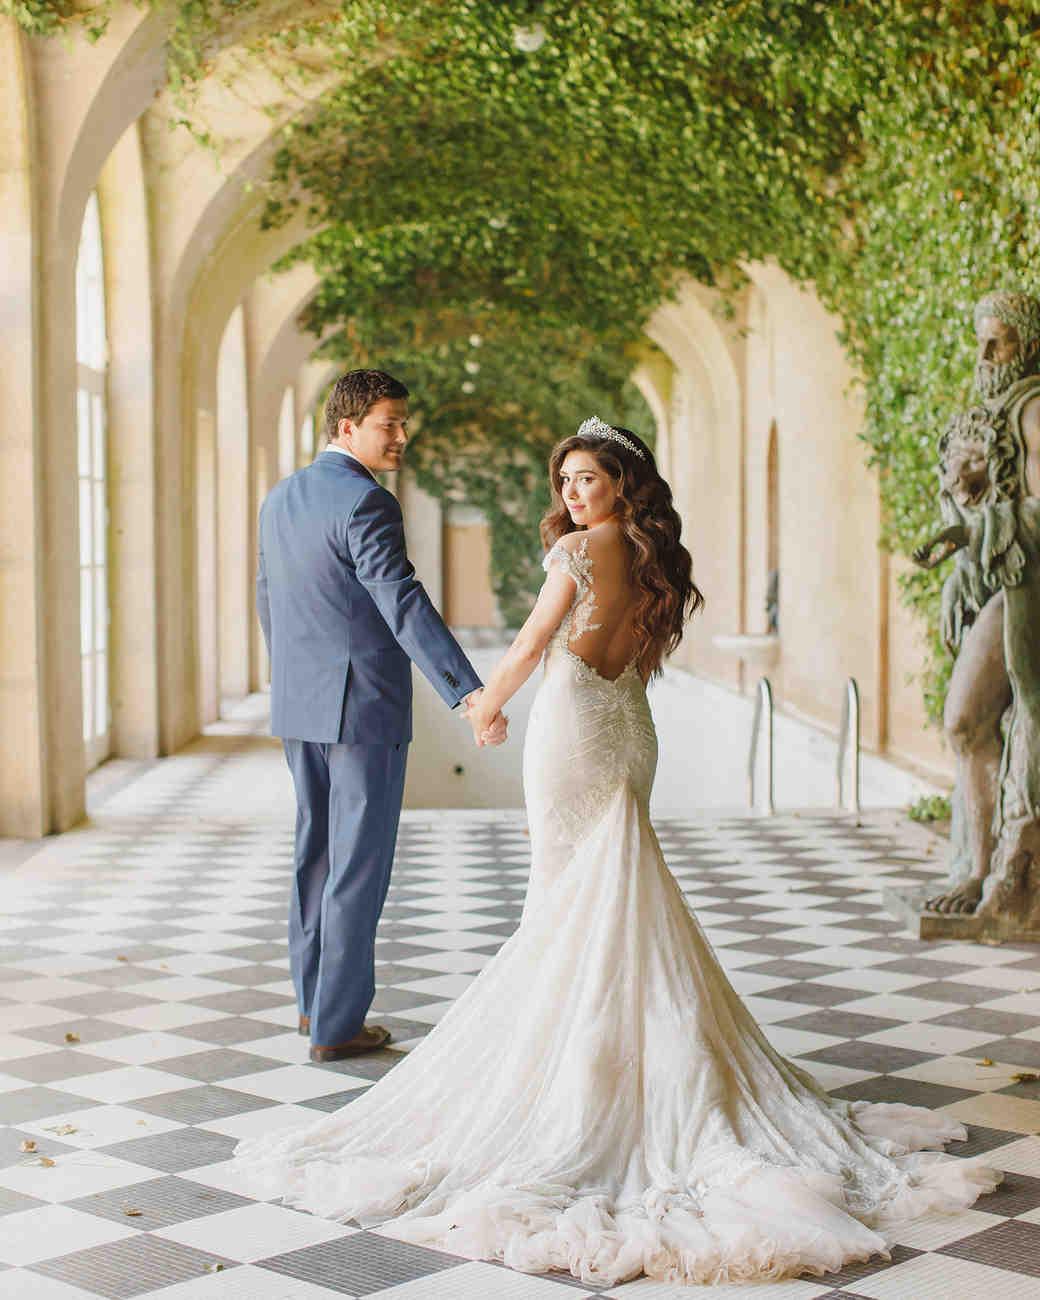 glamorous wedding ideas castle venue bride tiara